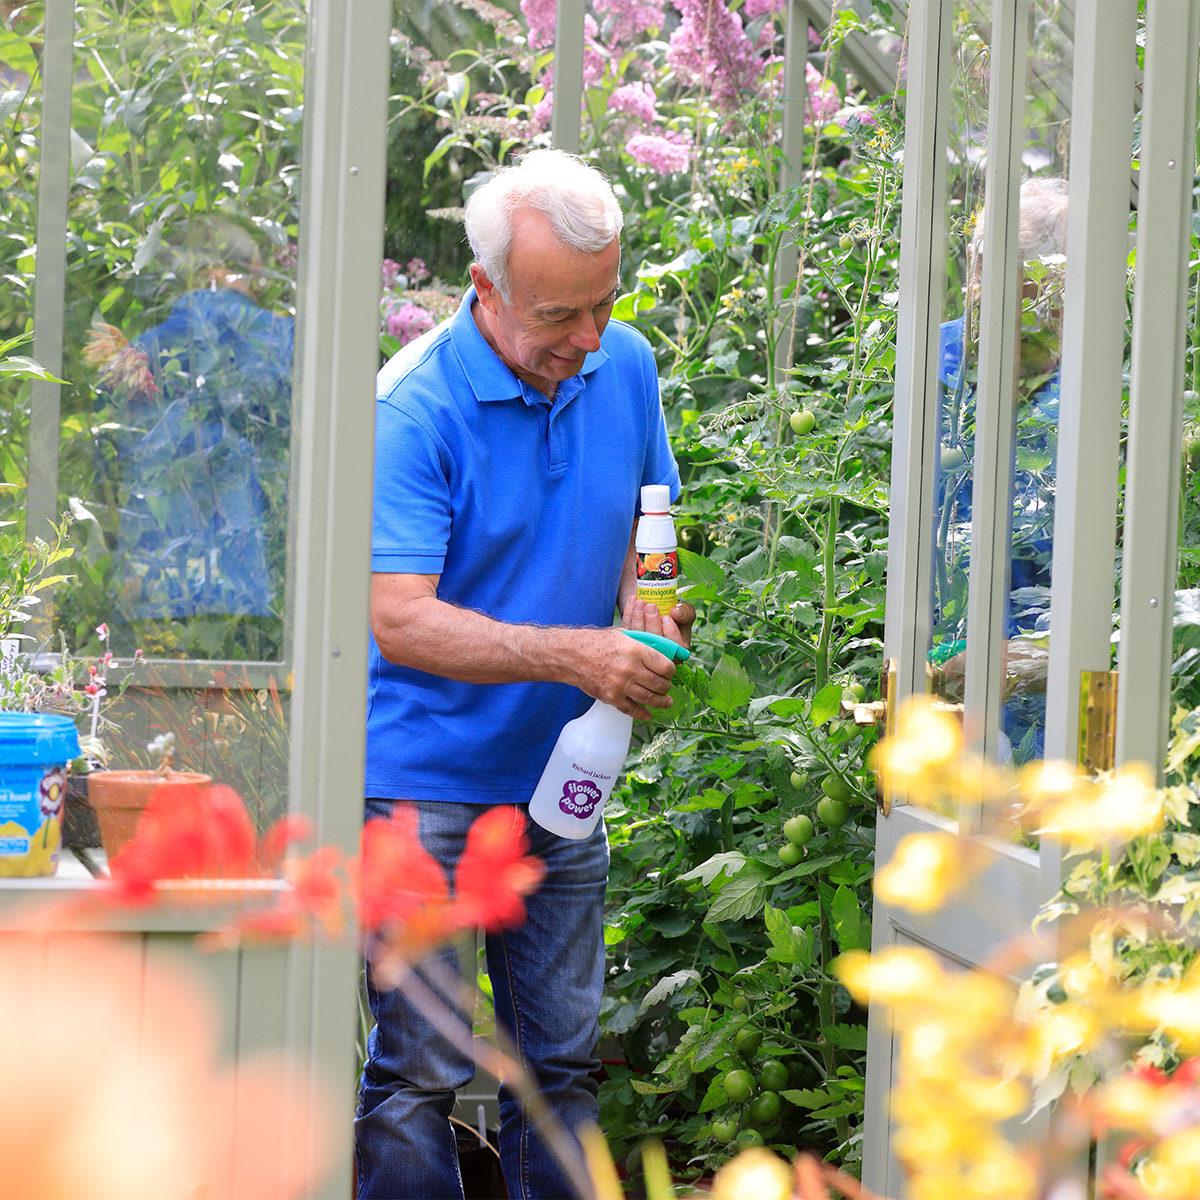 Richard spraying tomato plants with plant invigorator